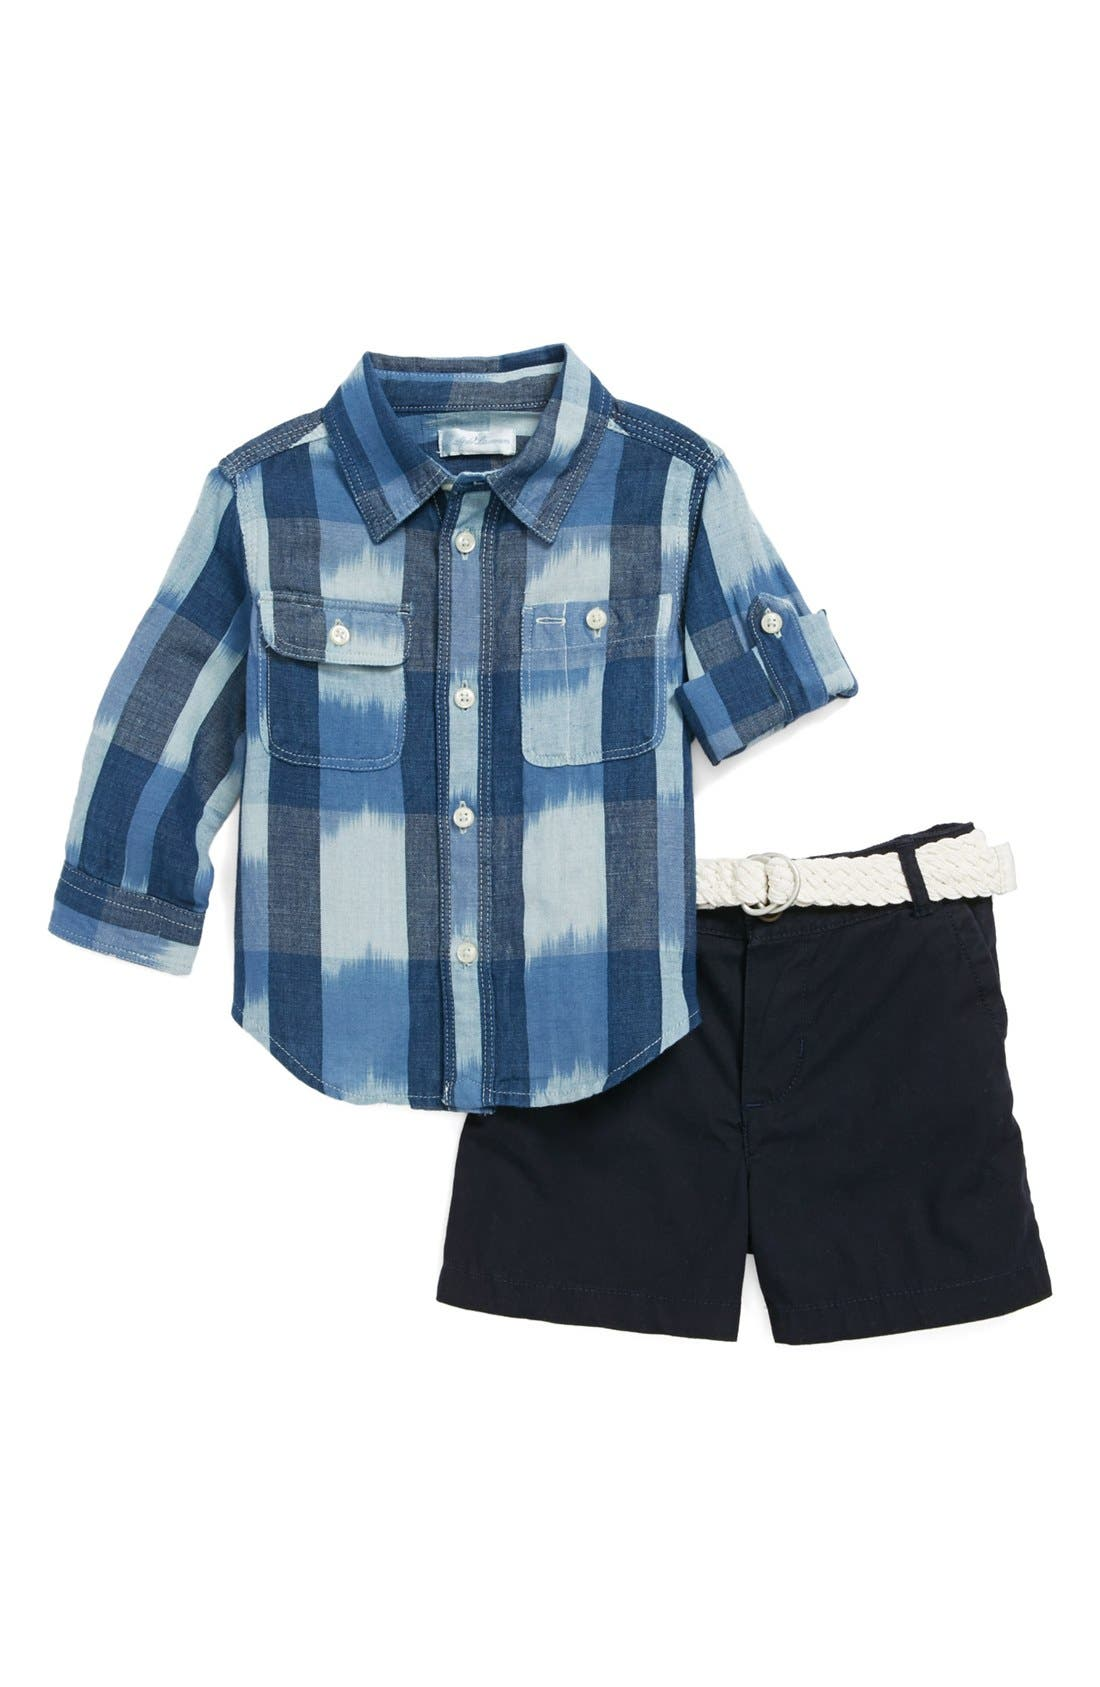 Alternate Image 1 Selected - Ralph Lauren Shirt, Belt & Woven Shorts (Baby Boys)